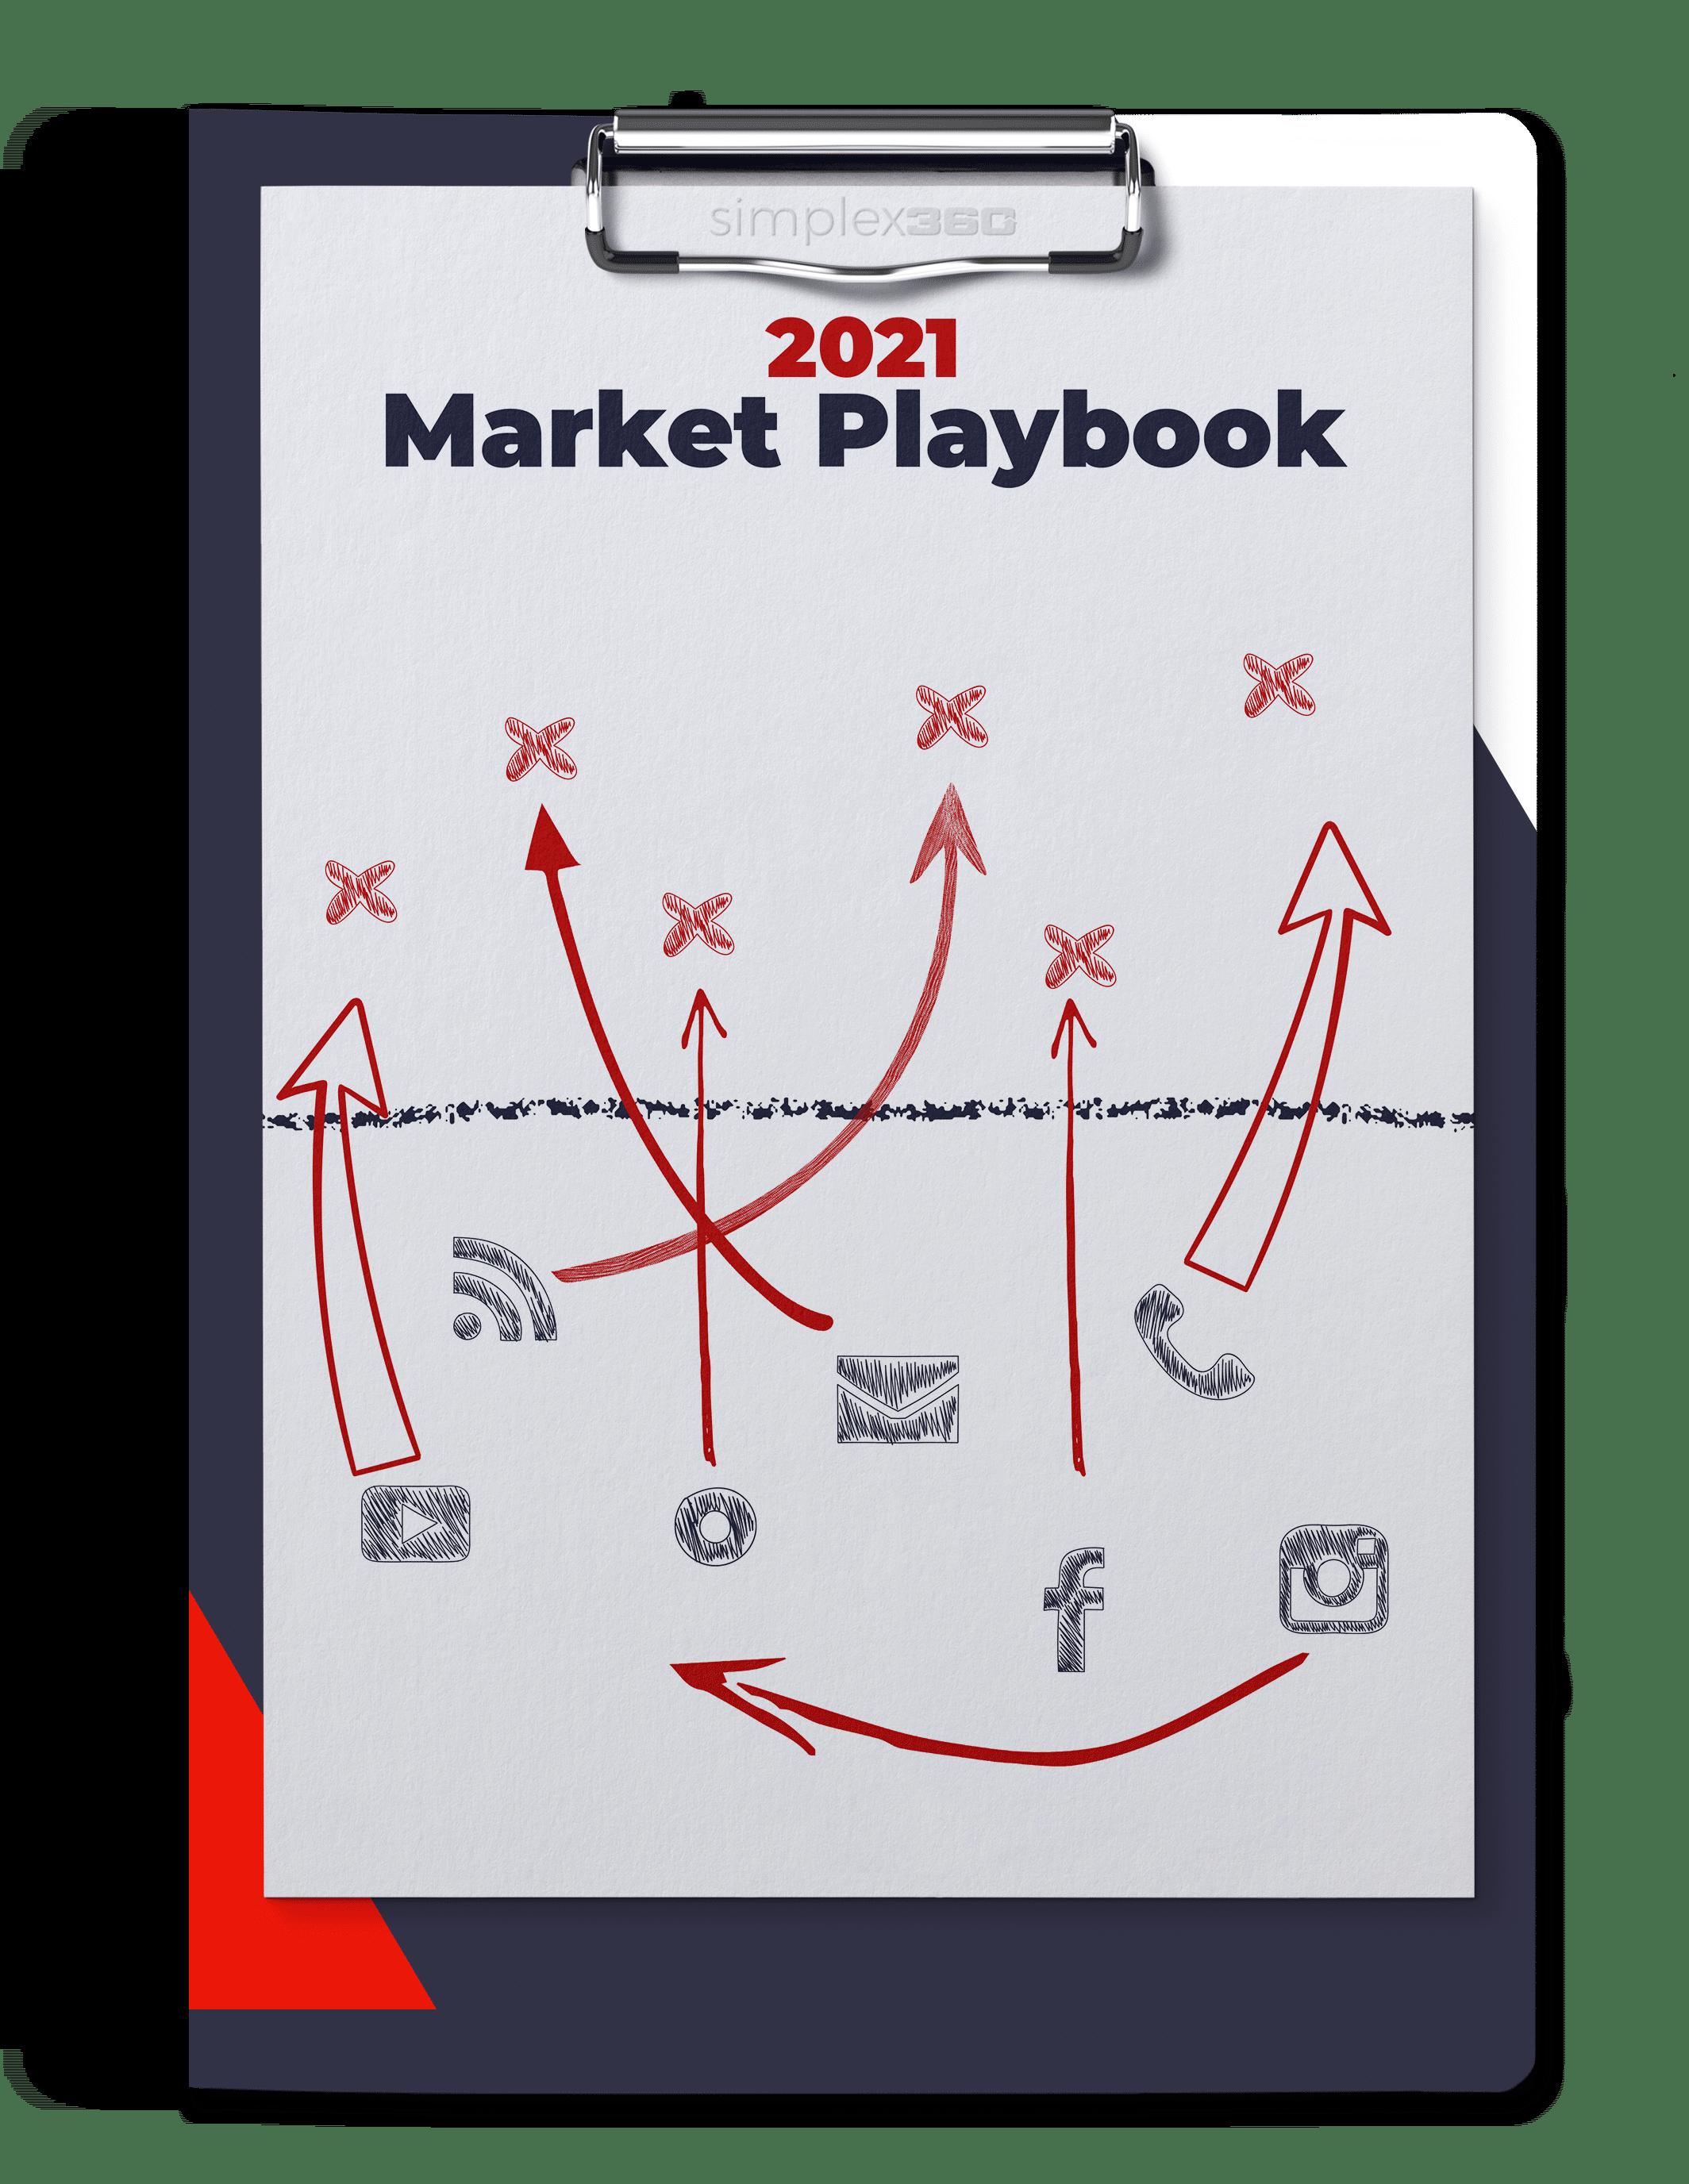 2021 Market Playbook